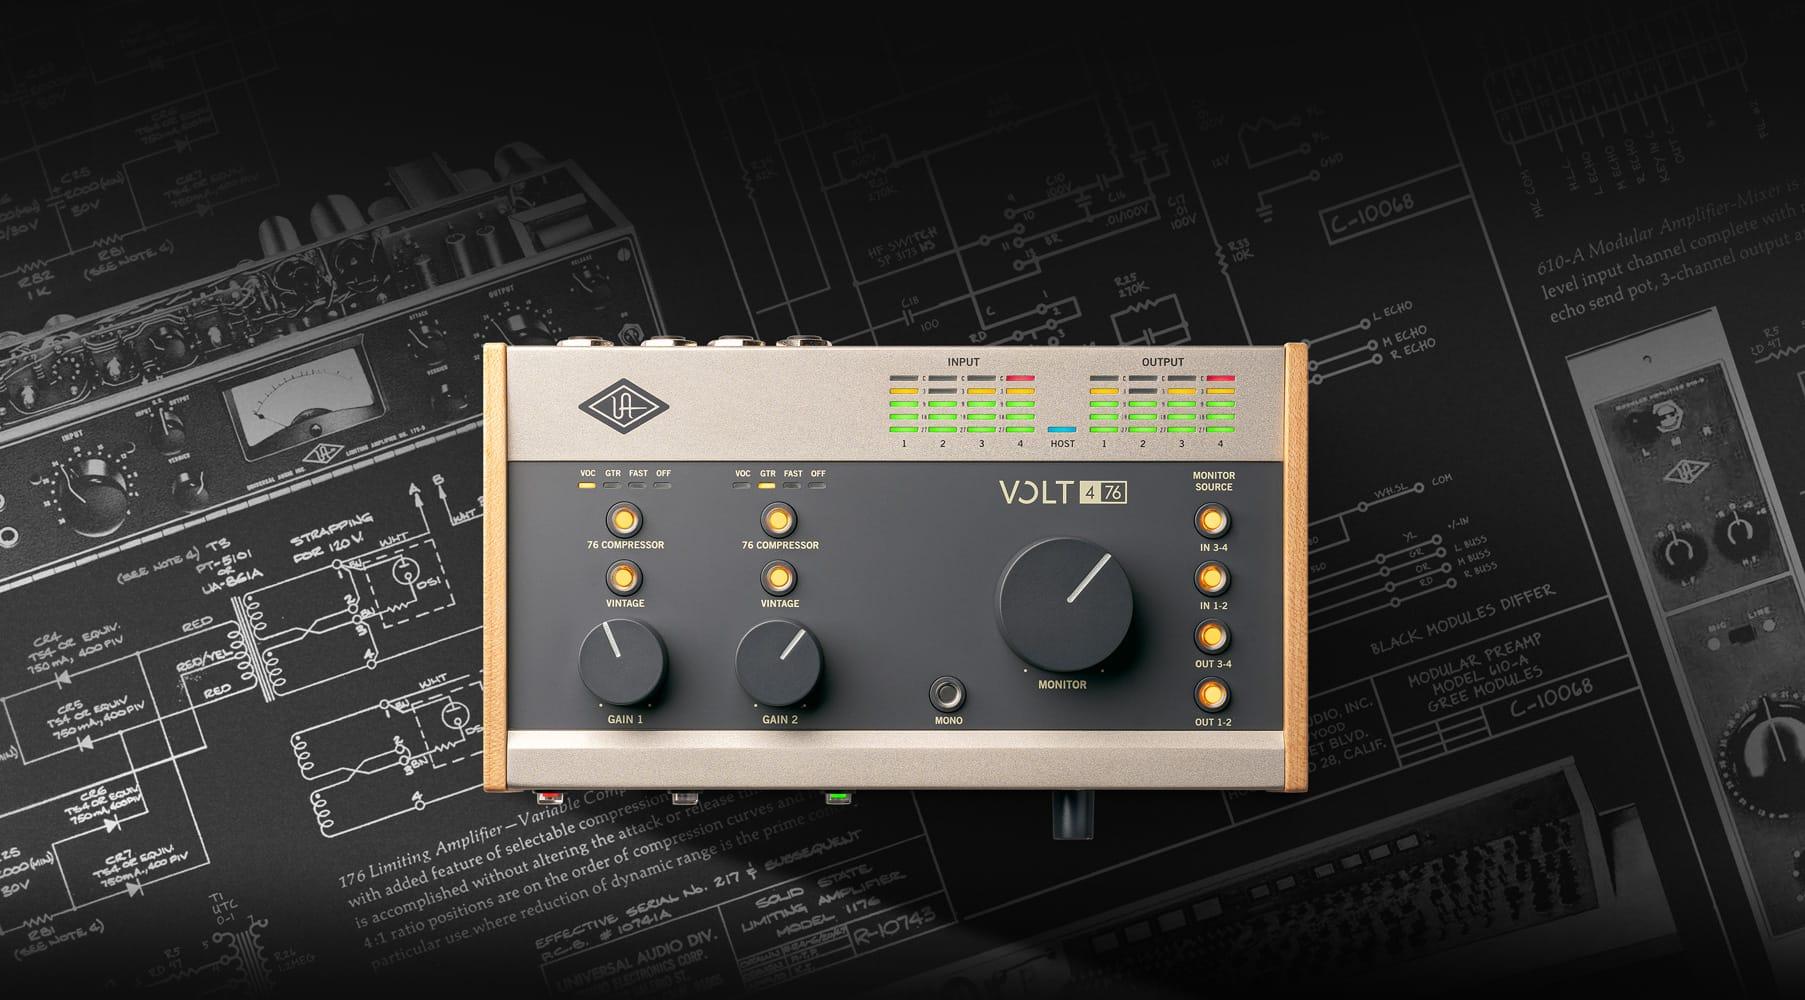 Volt USB Audio Interfaces